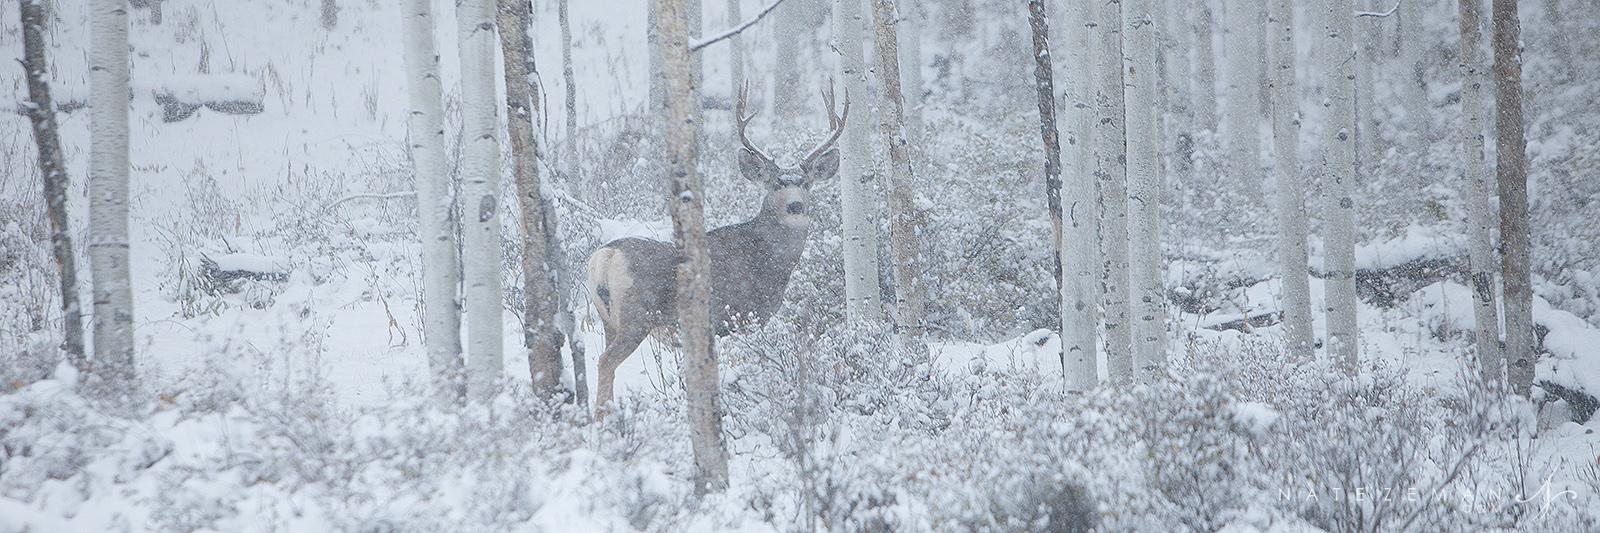 mule deer, buck, deer, colorado, snow, aspen, forest, woods, san juan mountains, co, photo